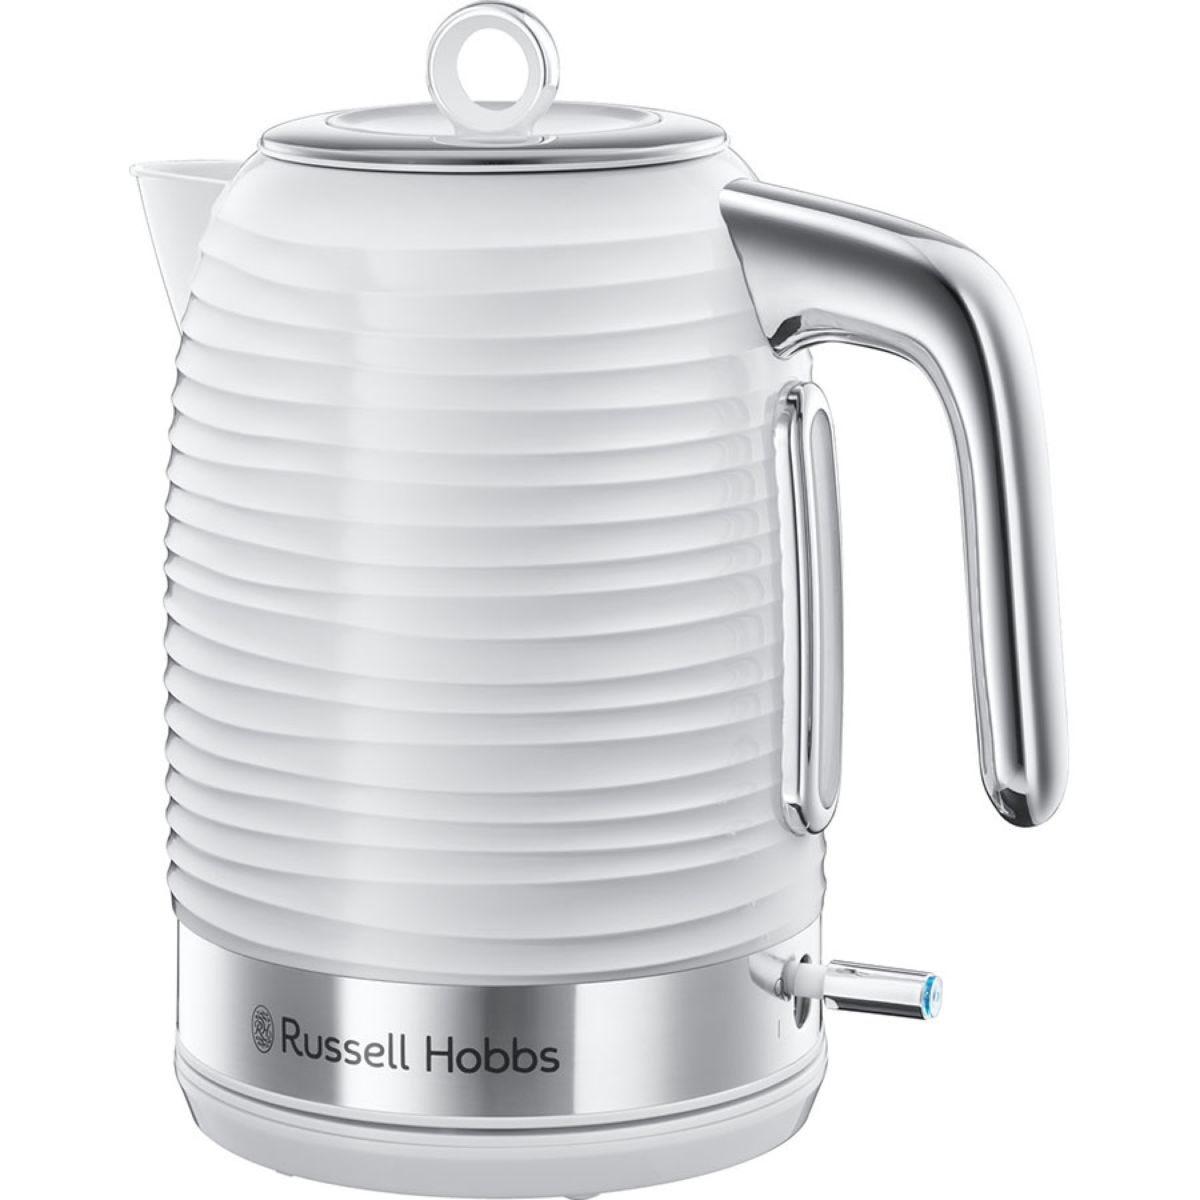 Russell Hobbs 24360 1.7L Inspire 3000W Fast Boil Kettle - White